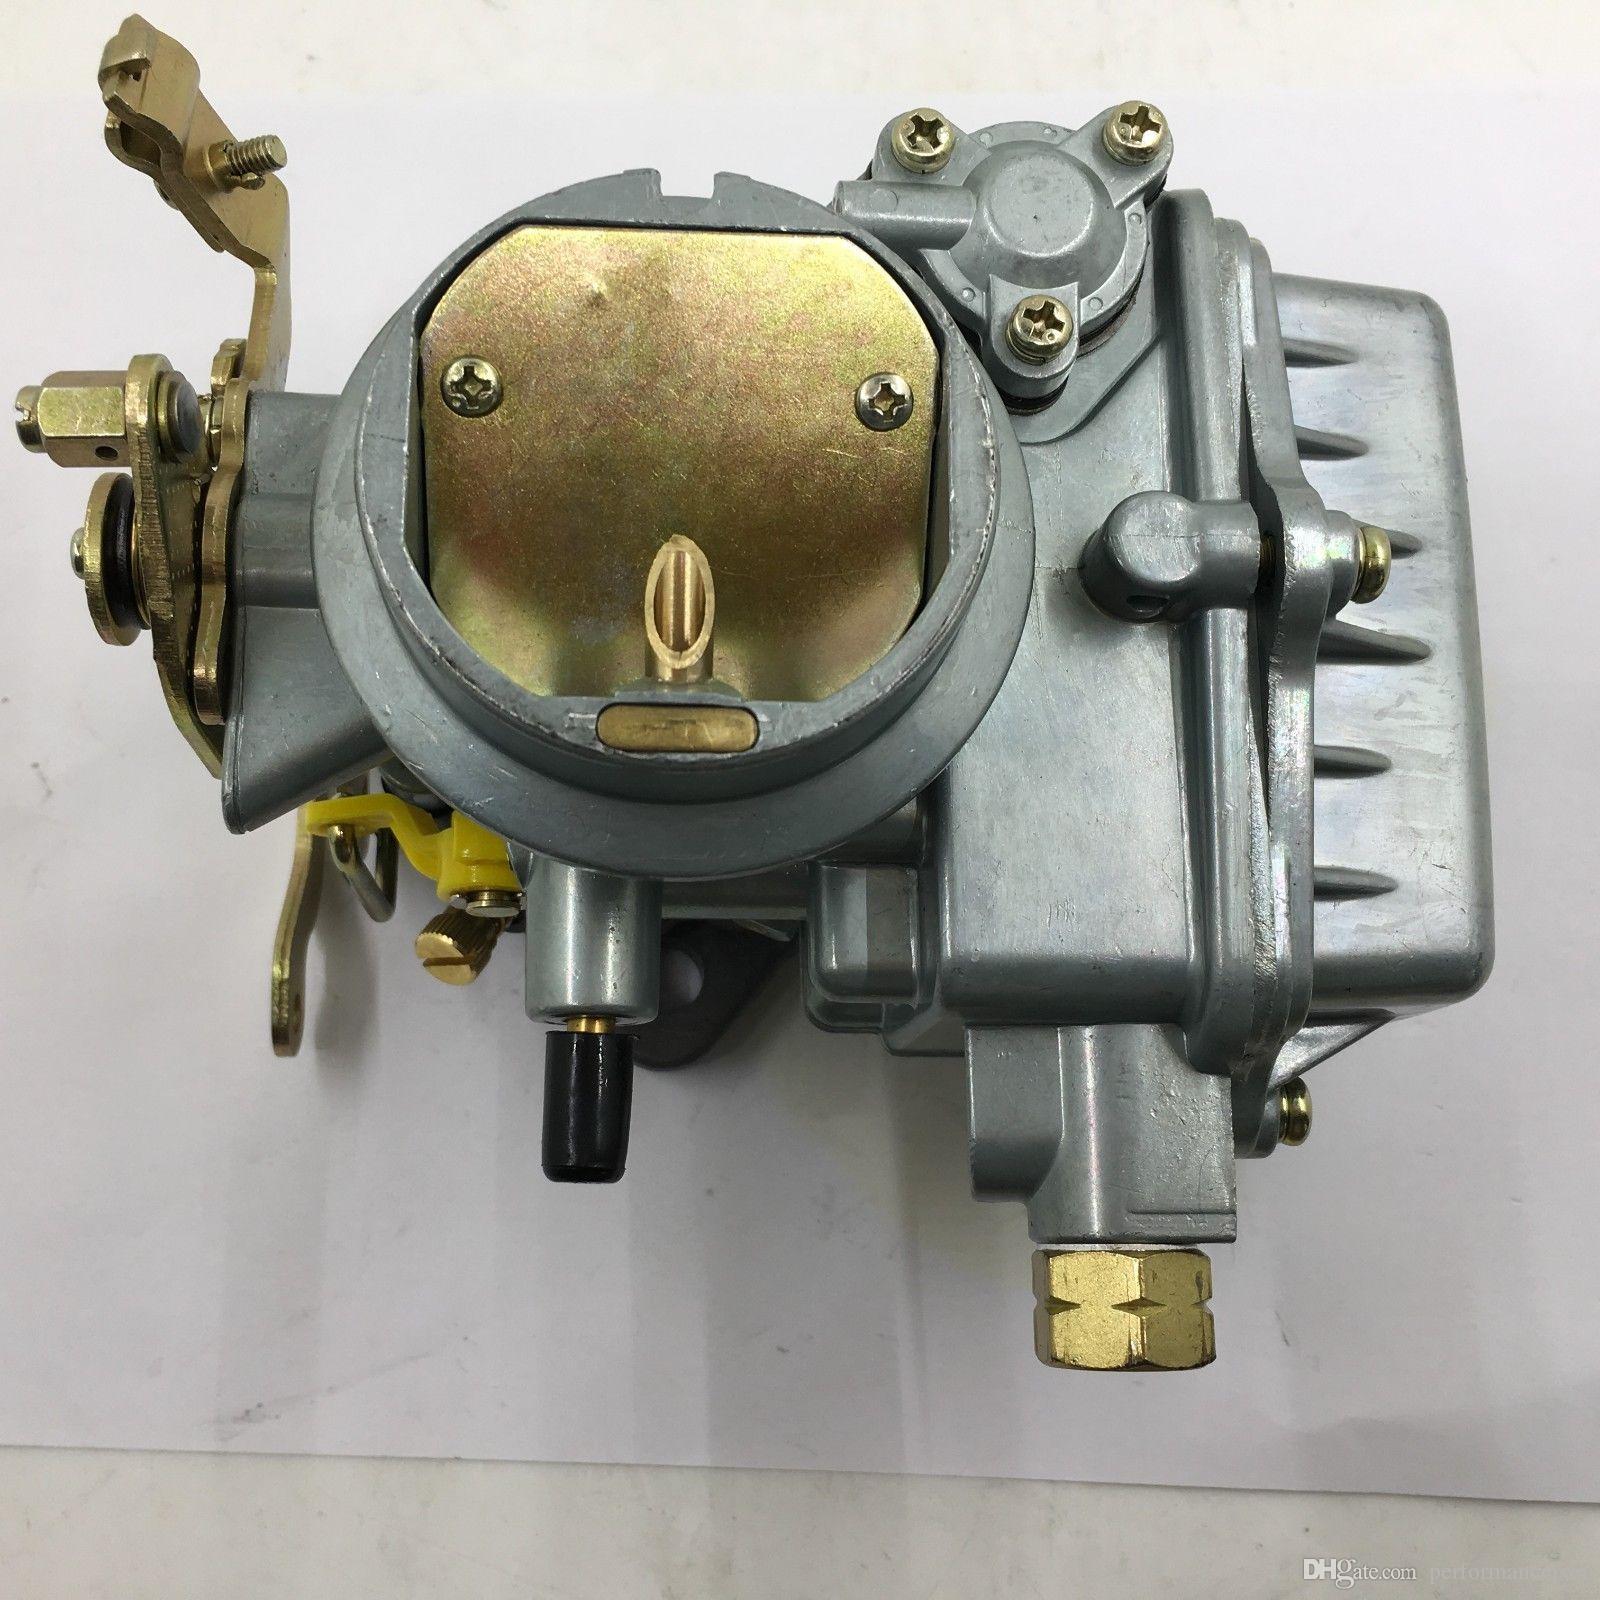 carburetor fit 1957 60 62 FORD 144 170 200 223 6CYL HOLLEY 1904 CARB 1  BARREL